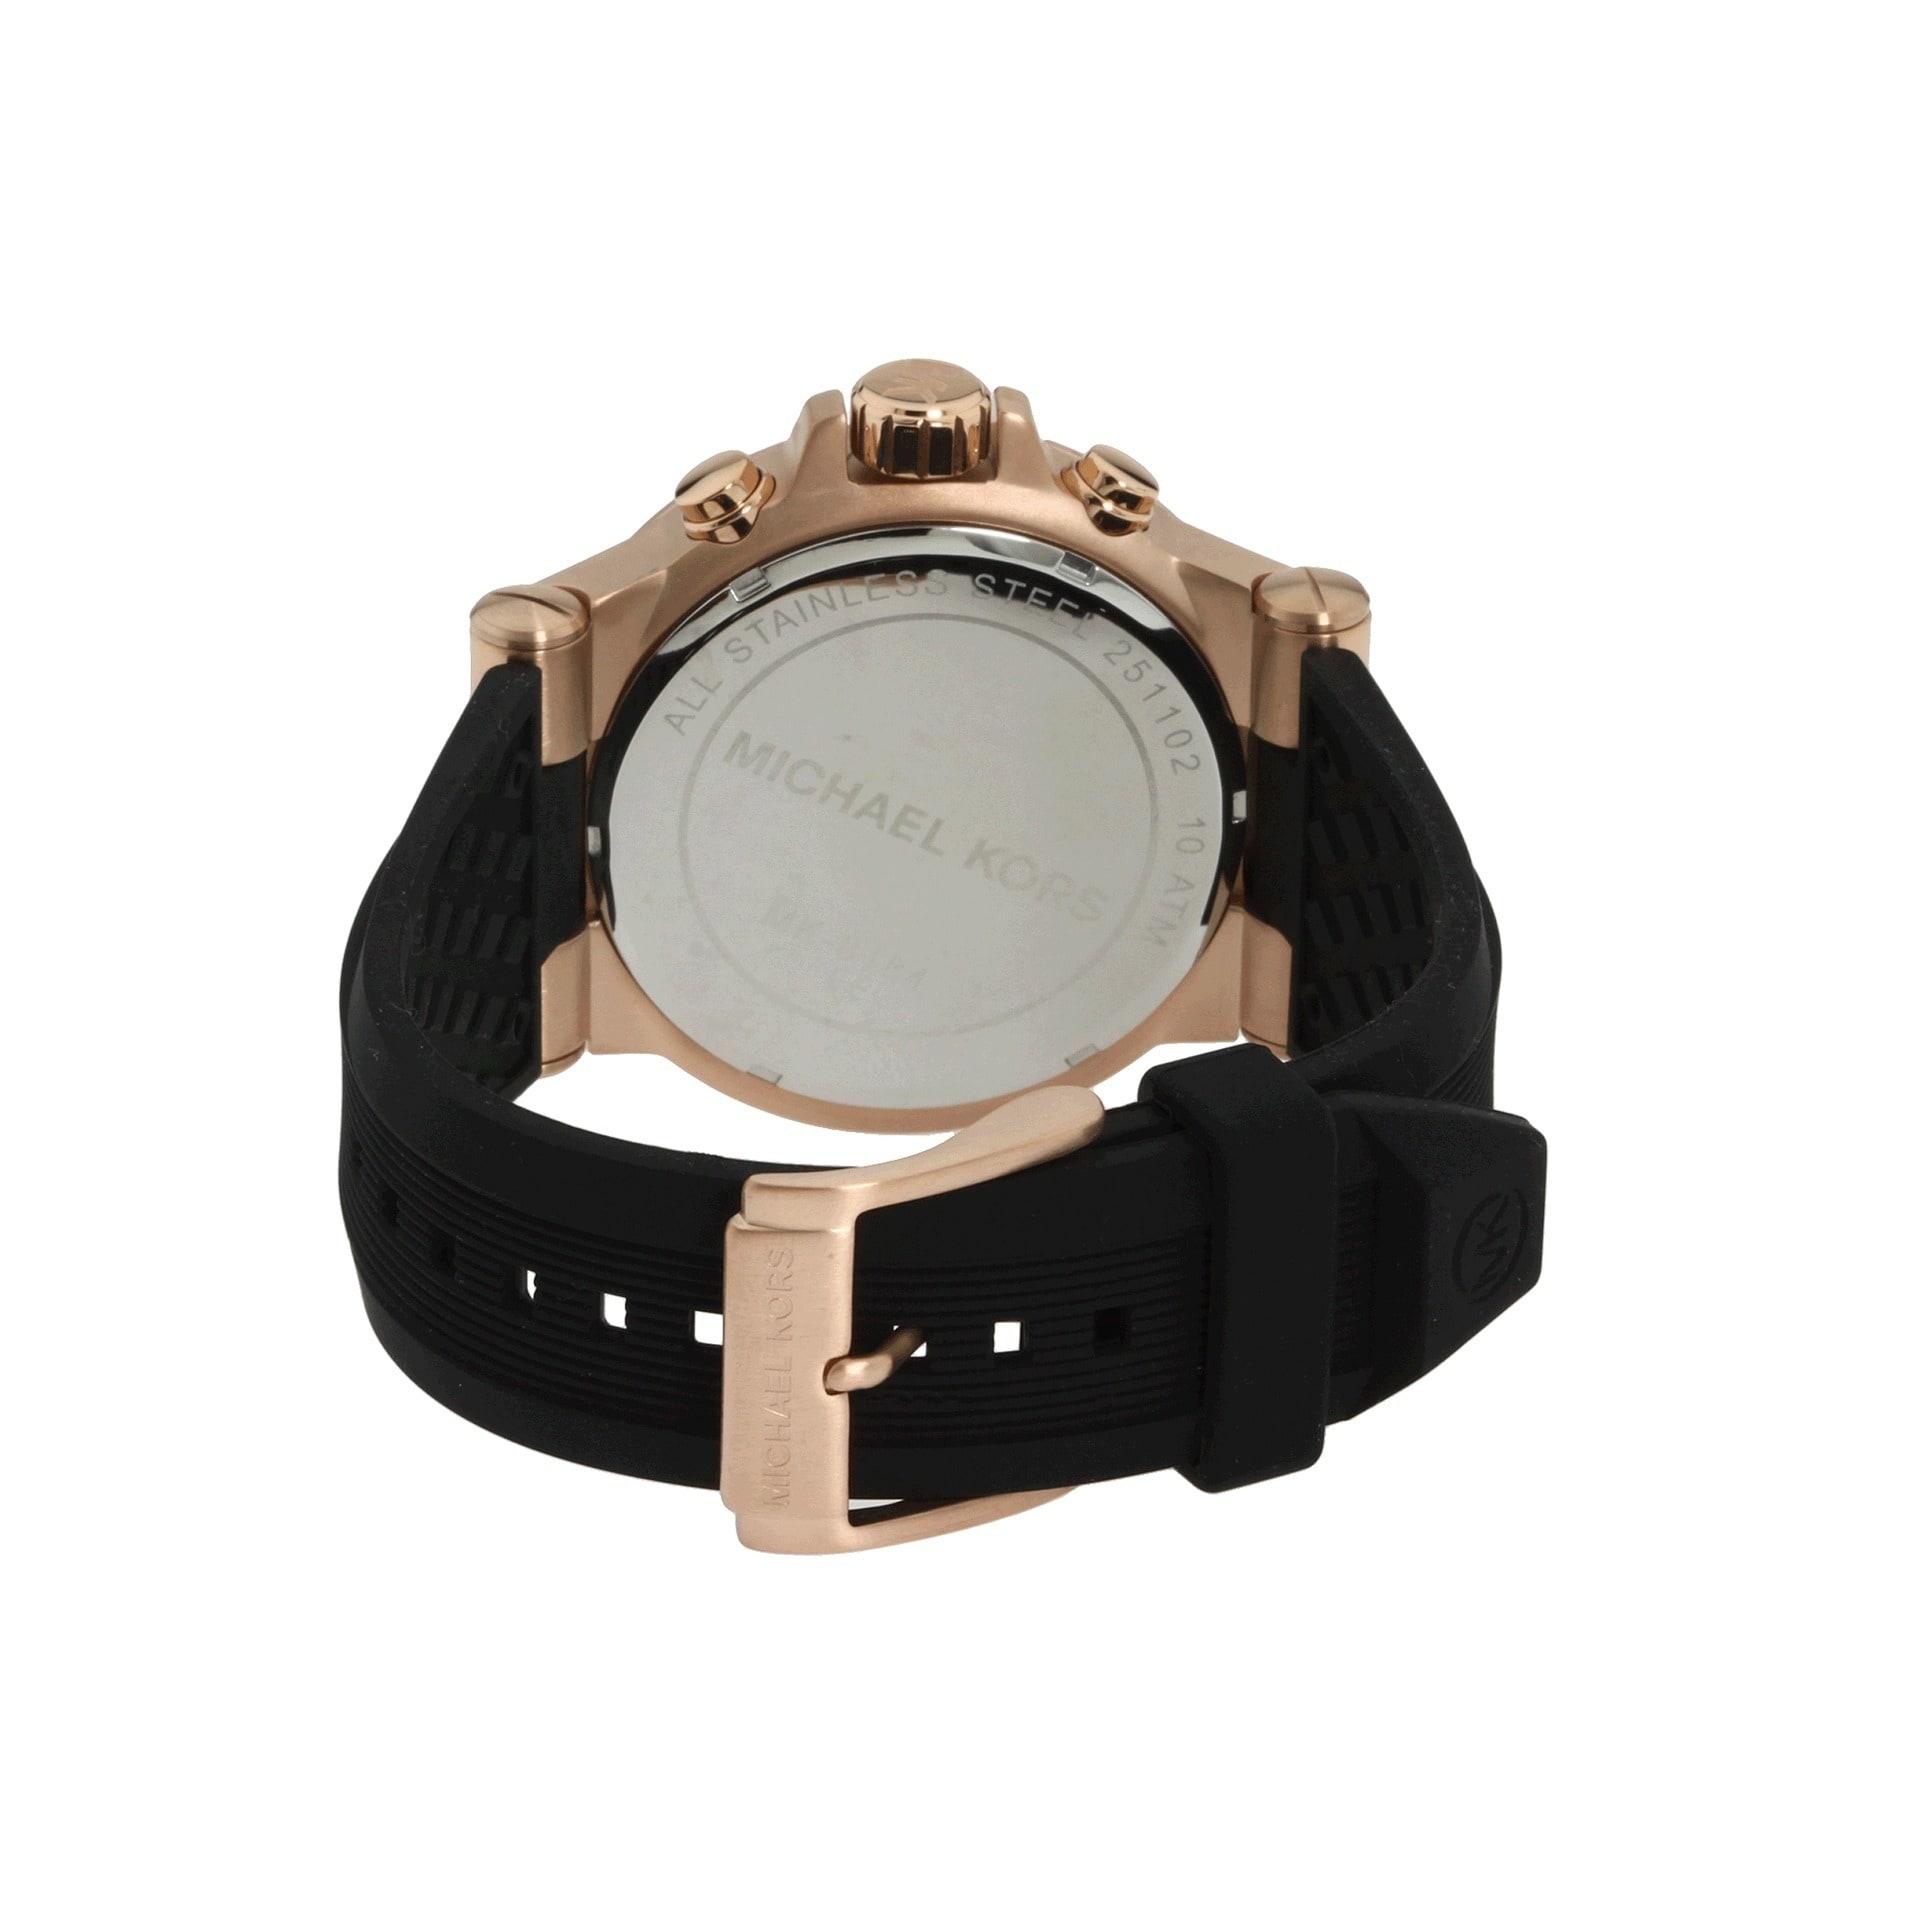 14a20db1b6b8 Shop Michael Kors Men s MK8184 Rose Goldtone Watch - Black - Free Shipping  Today - Overstock - 6232993